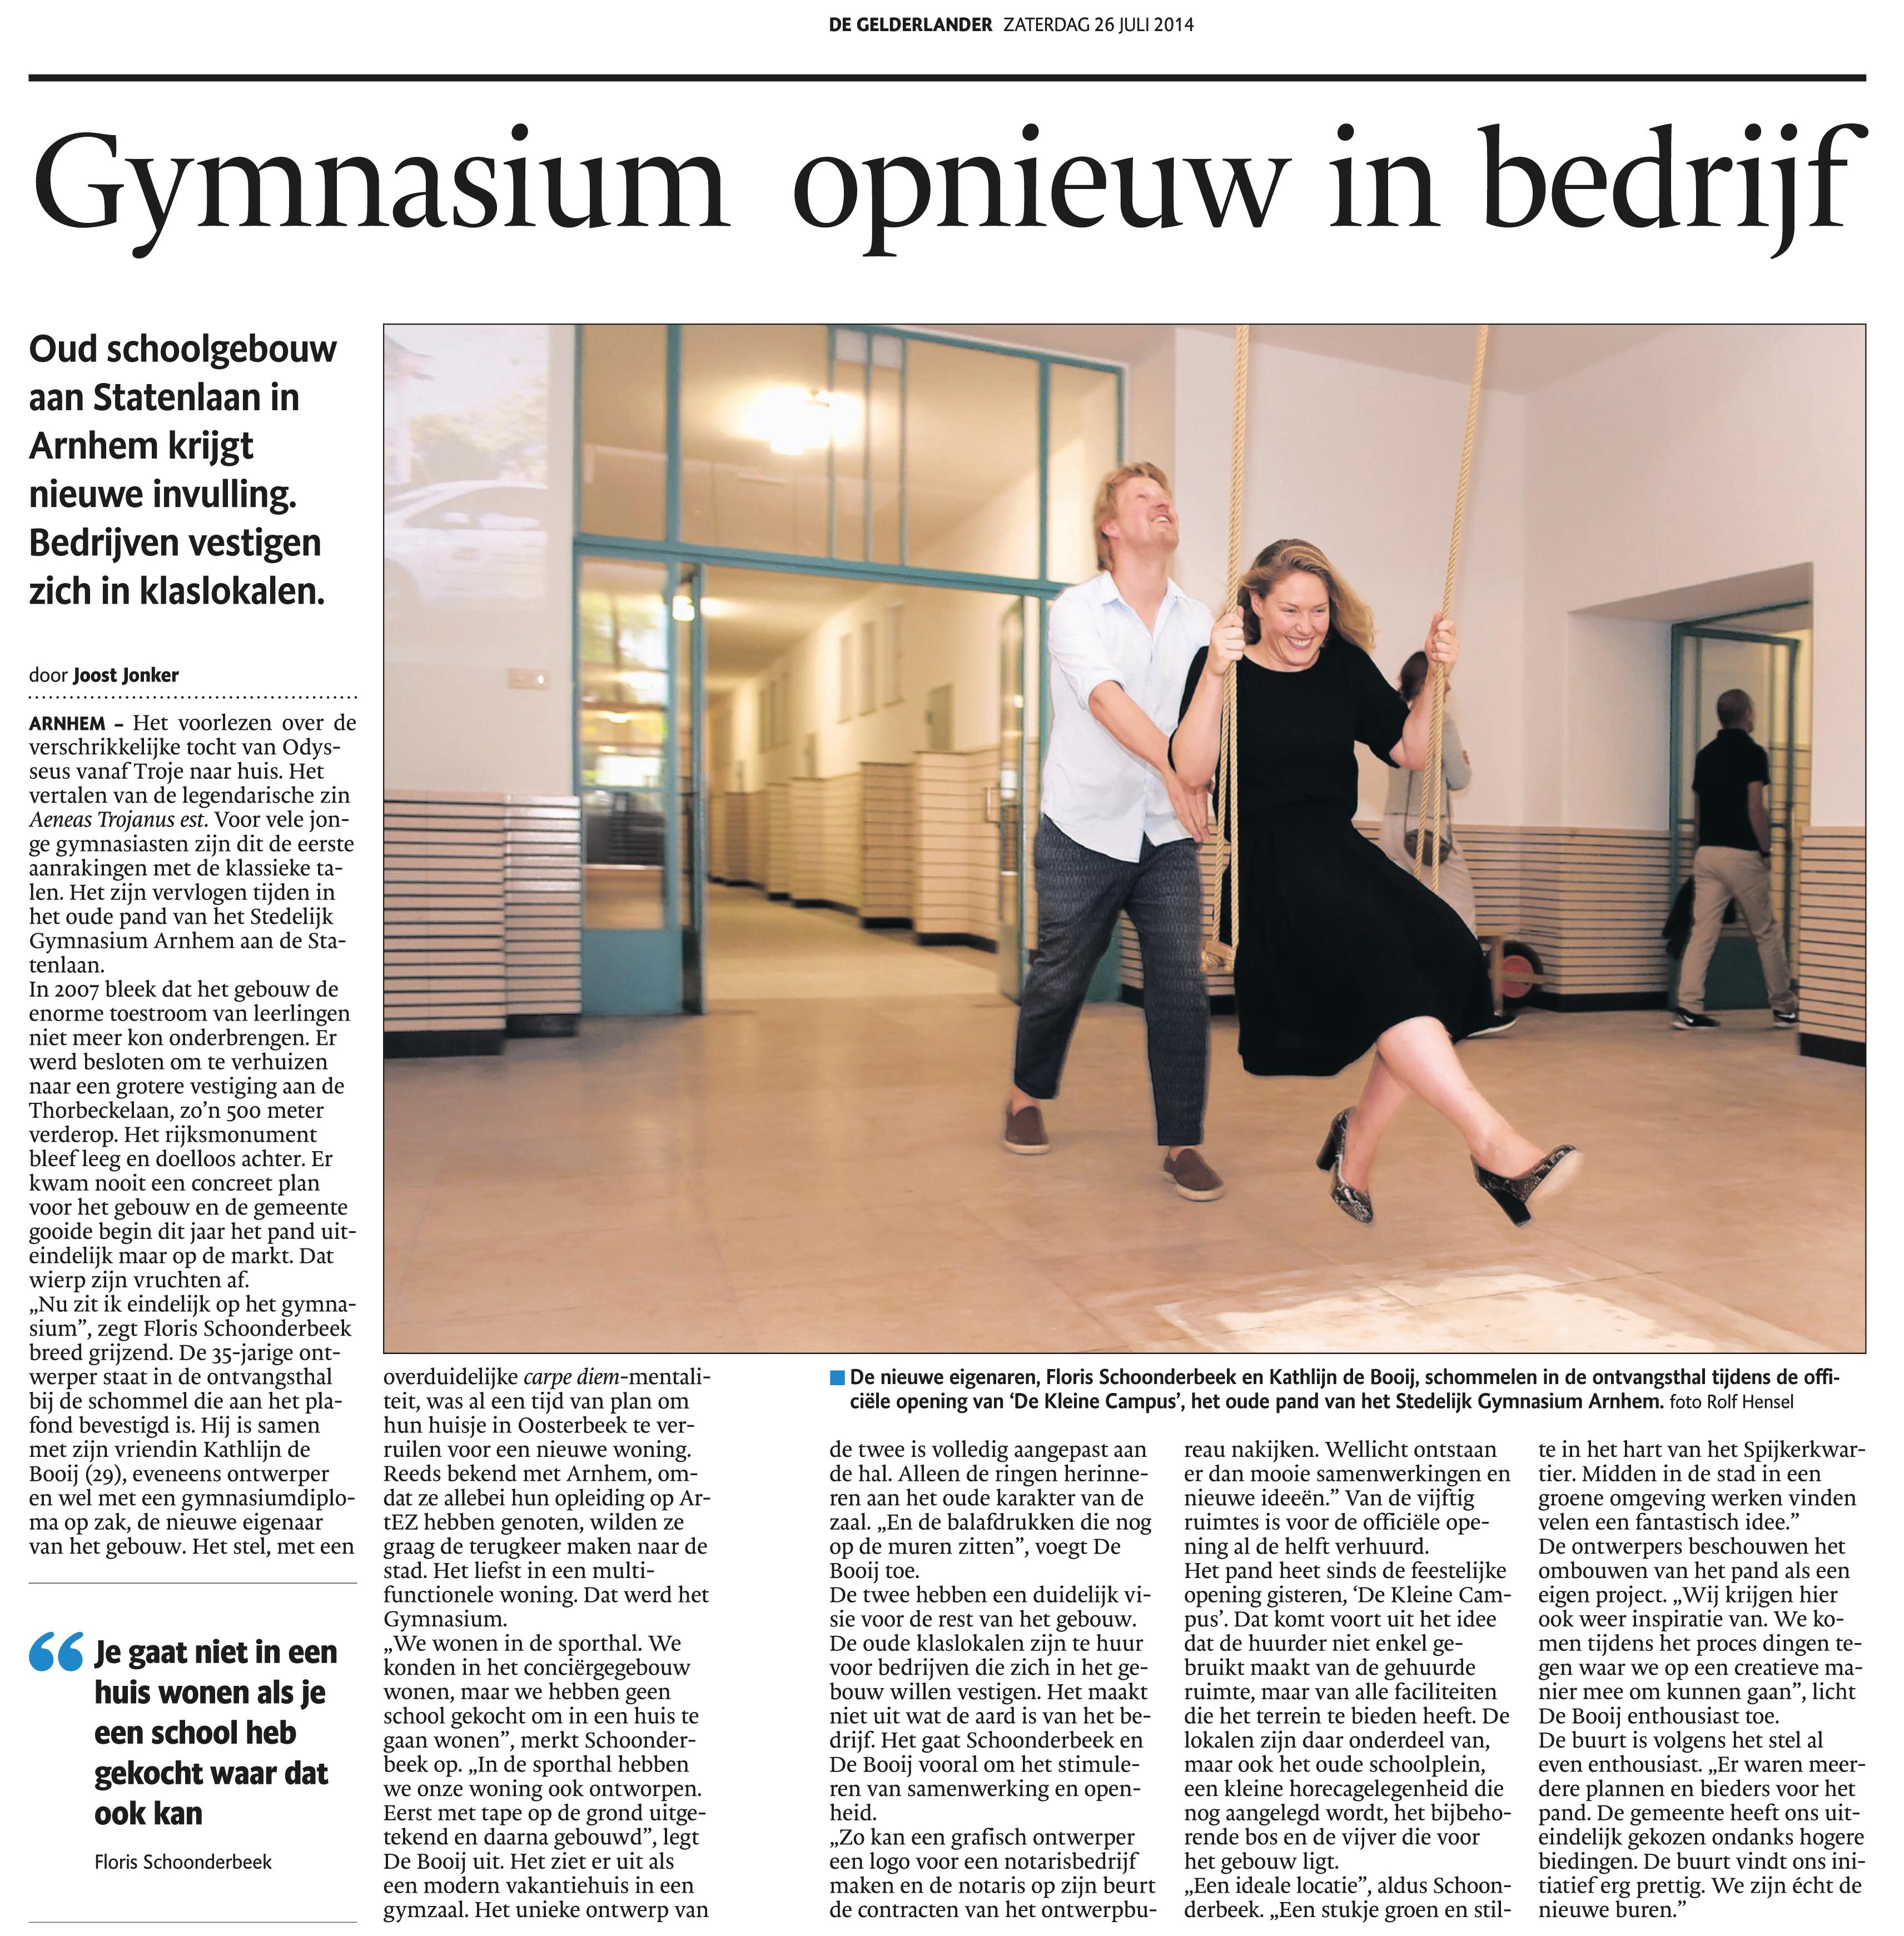 artikel gelderlander 26 juli 2014 digitaal